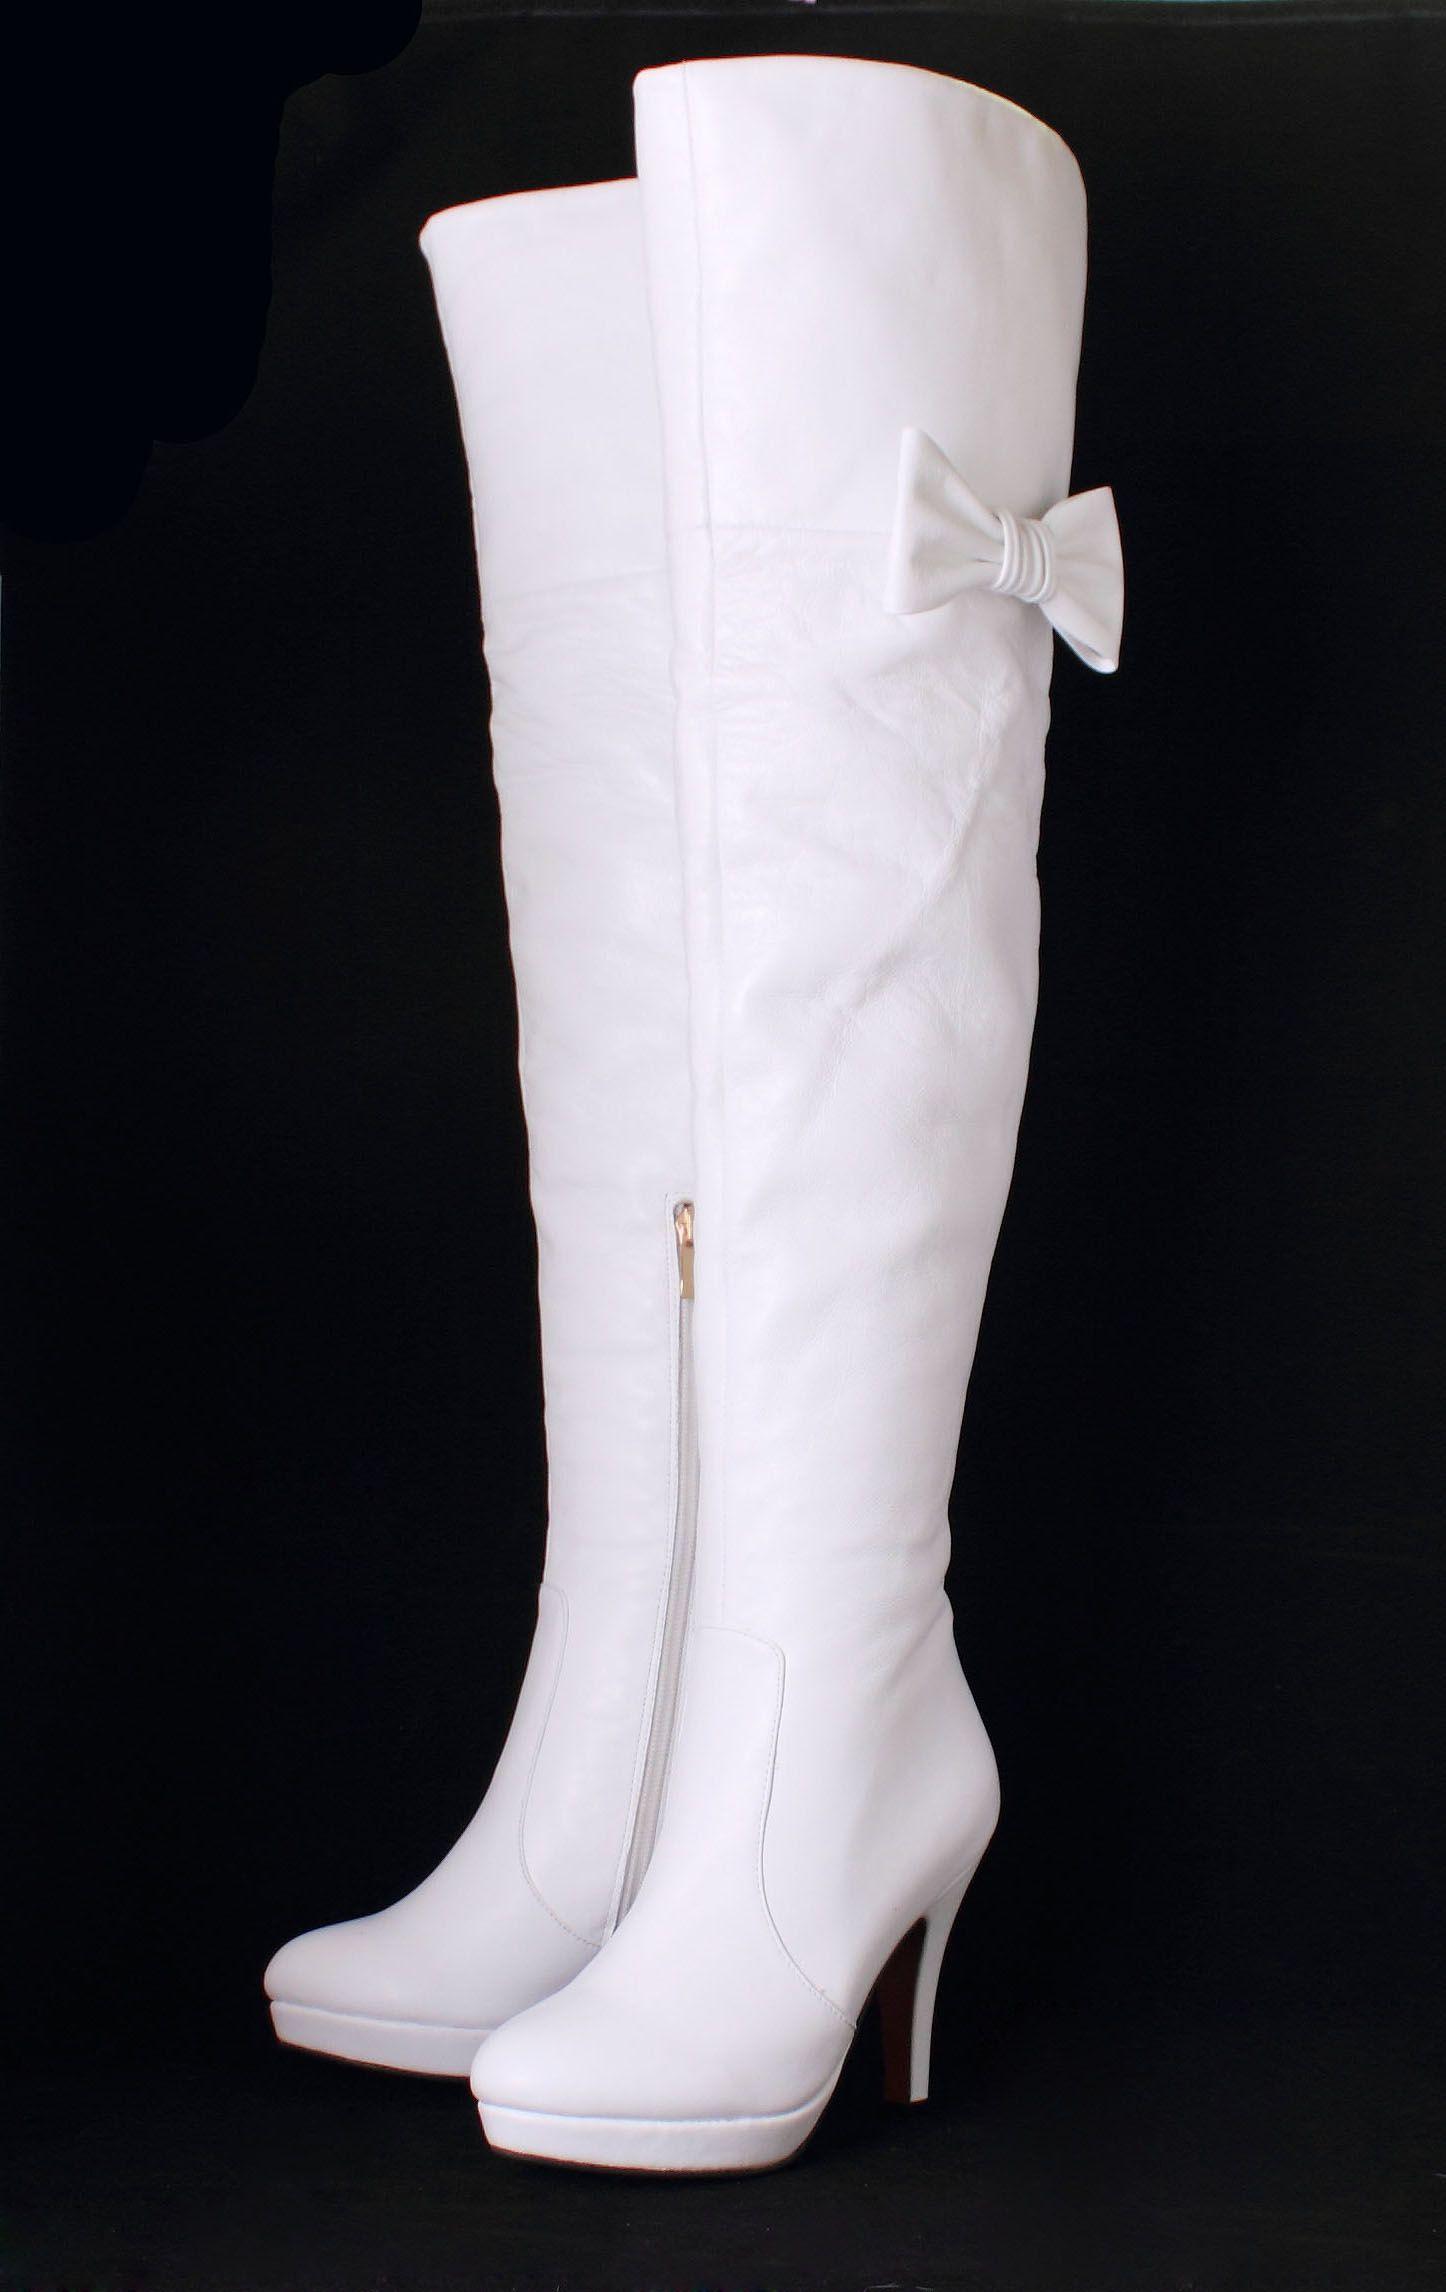 d1c56d3983019 de alta con lazo blanco botas blancas de tacón alto botas altas de ...